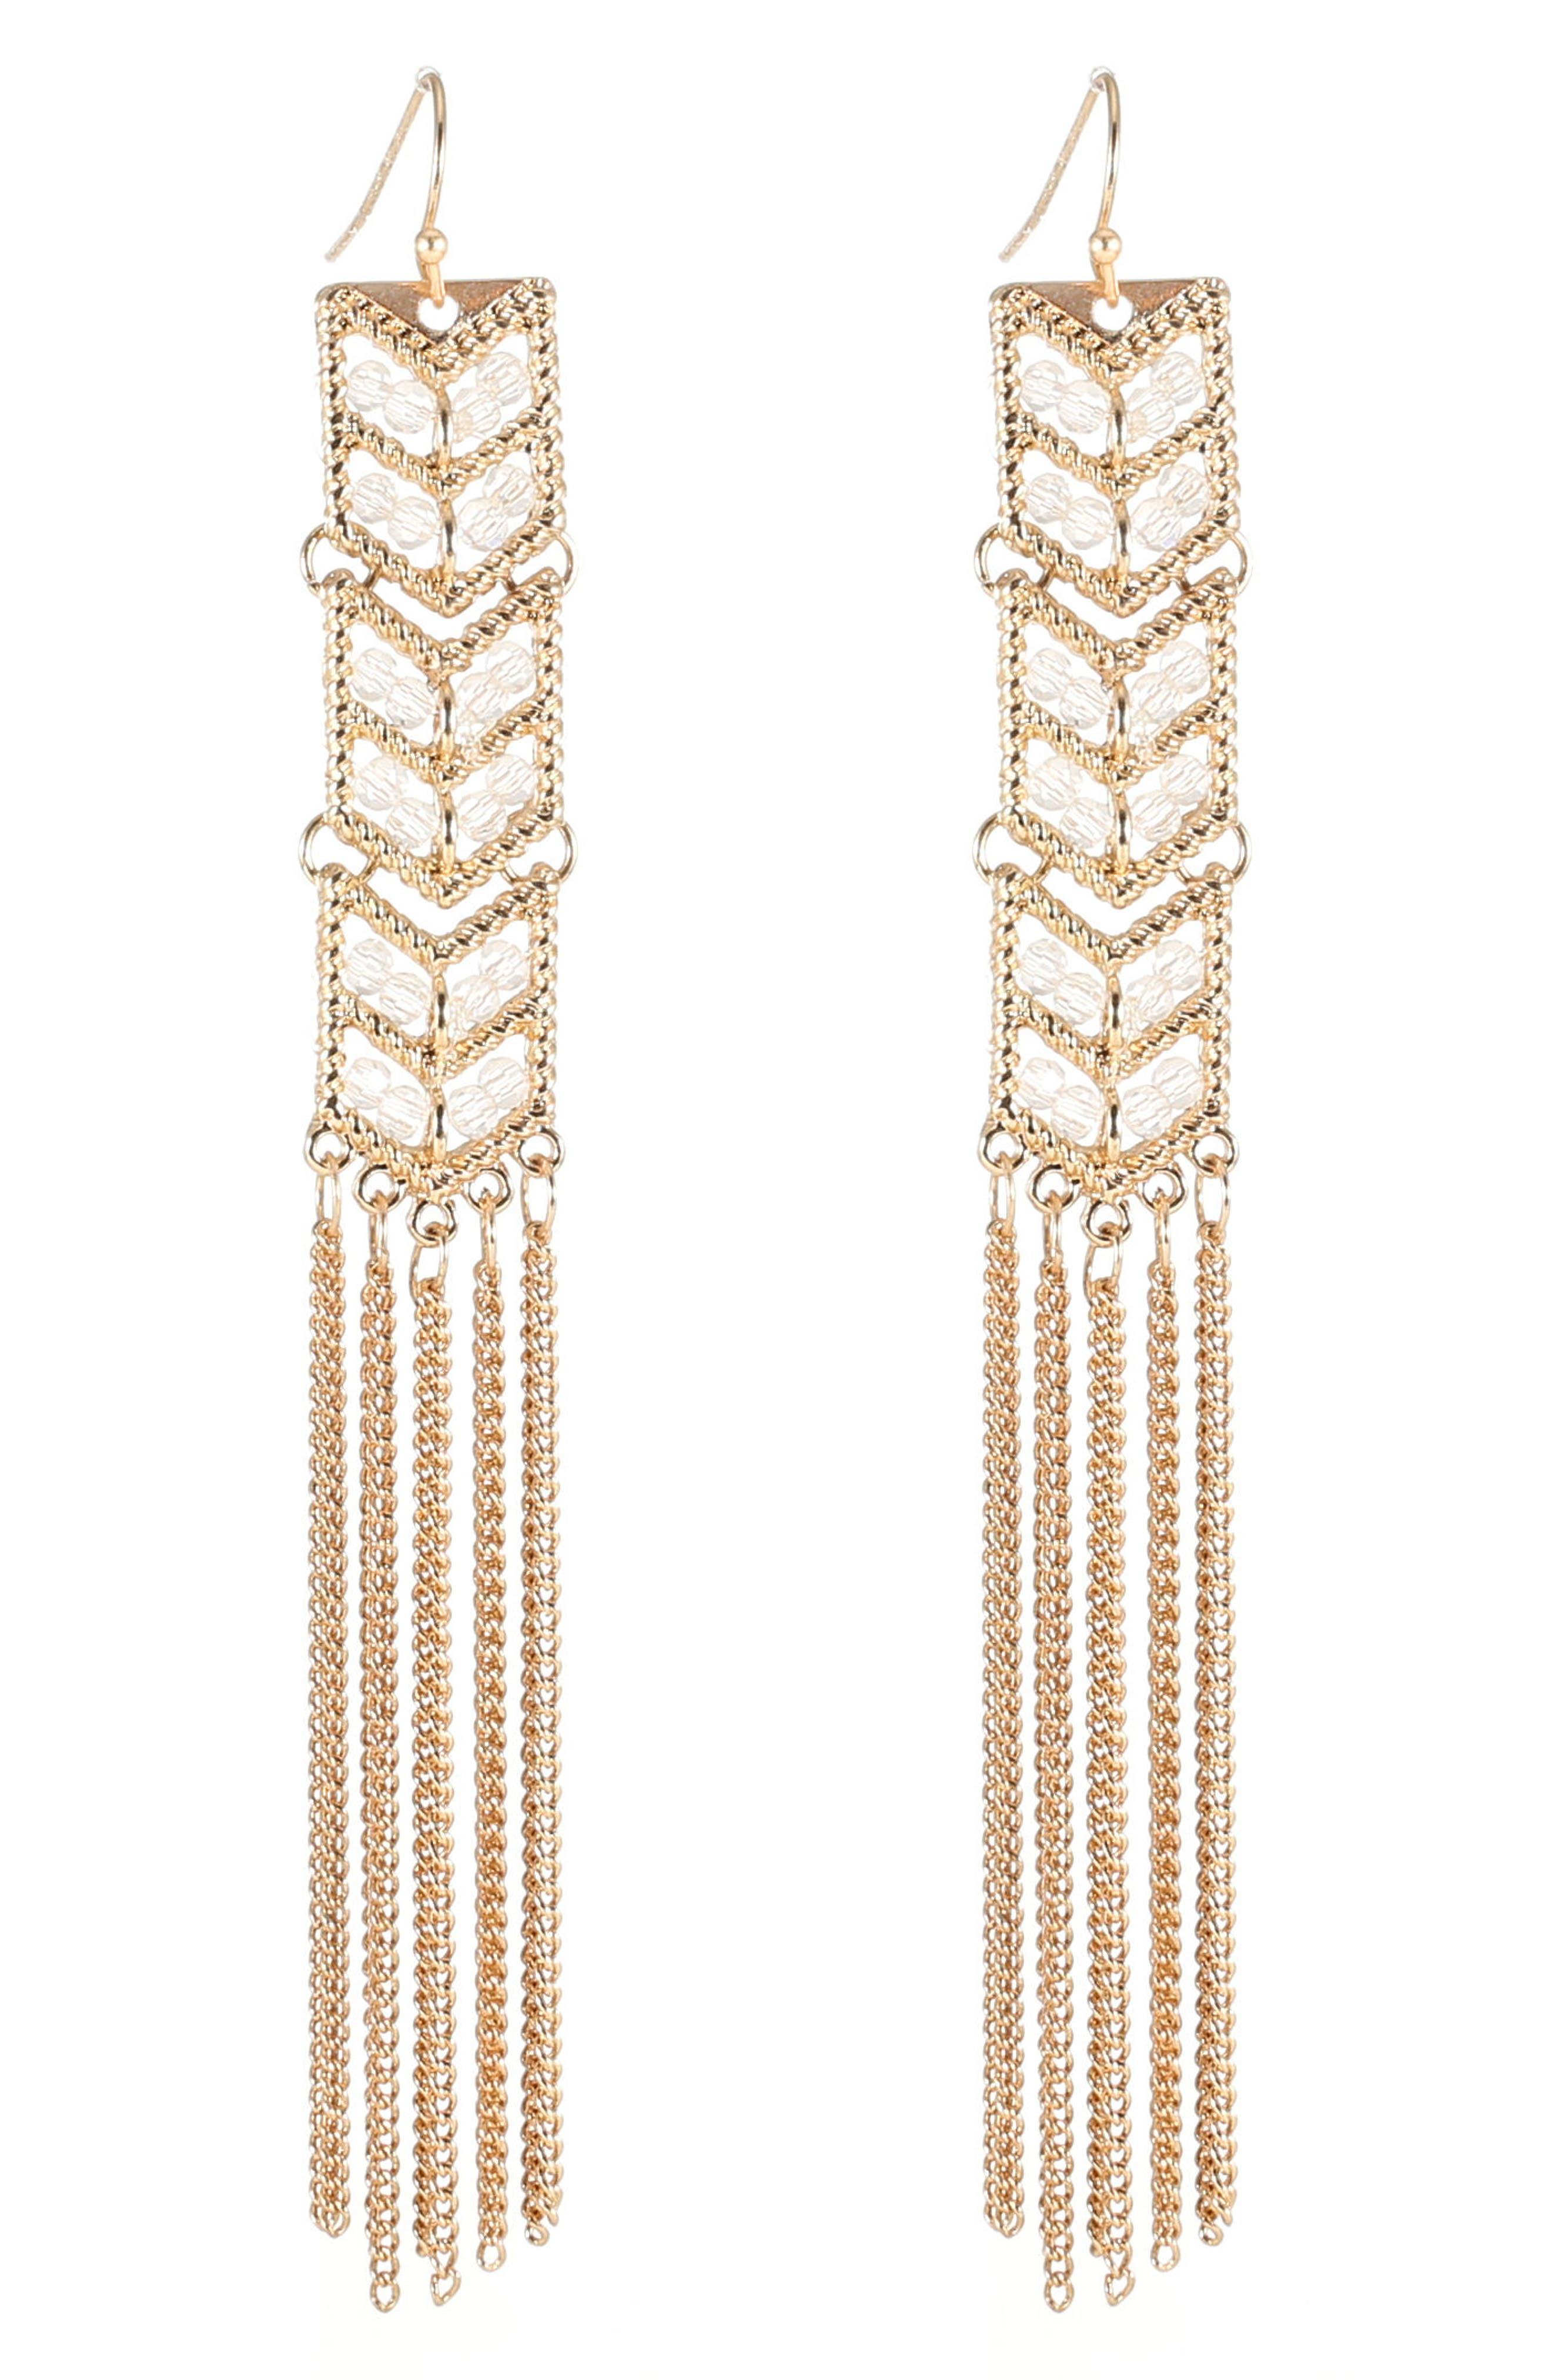 Tassel Chain Statement Earrings,                             Main thumbnail 1, color,                             710